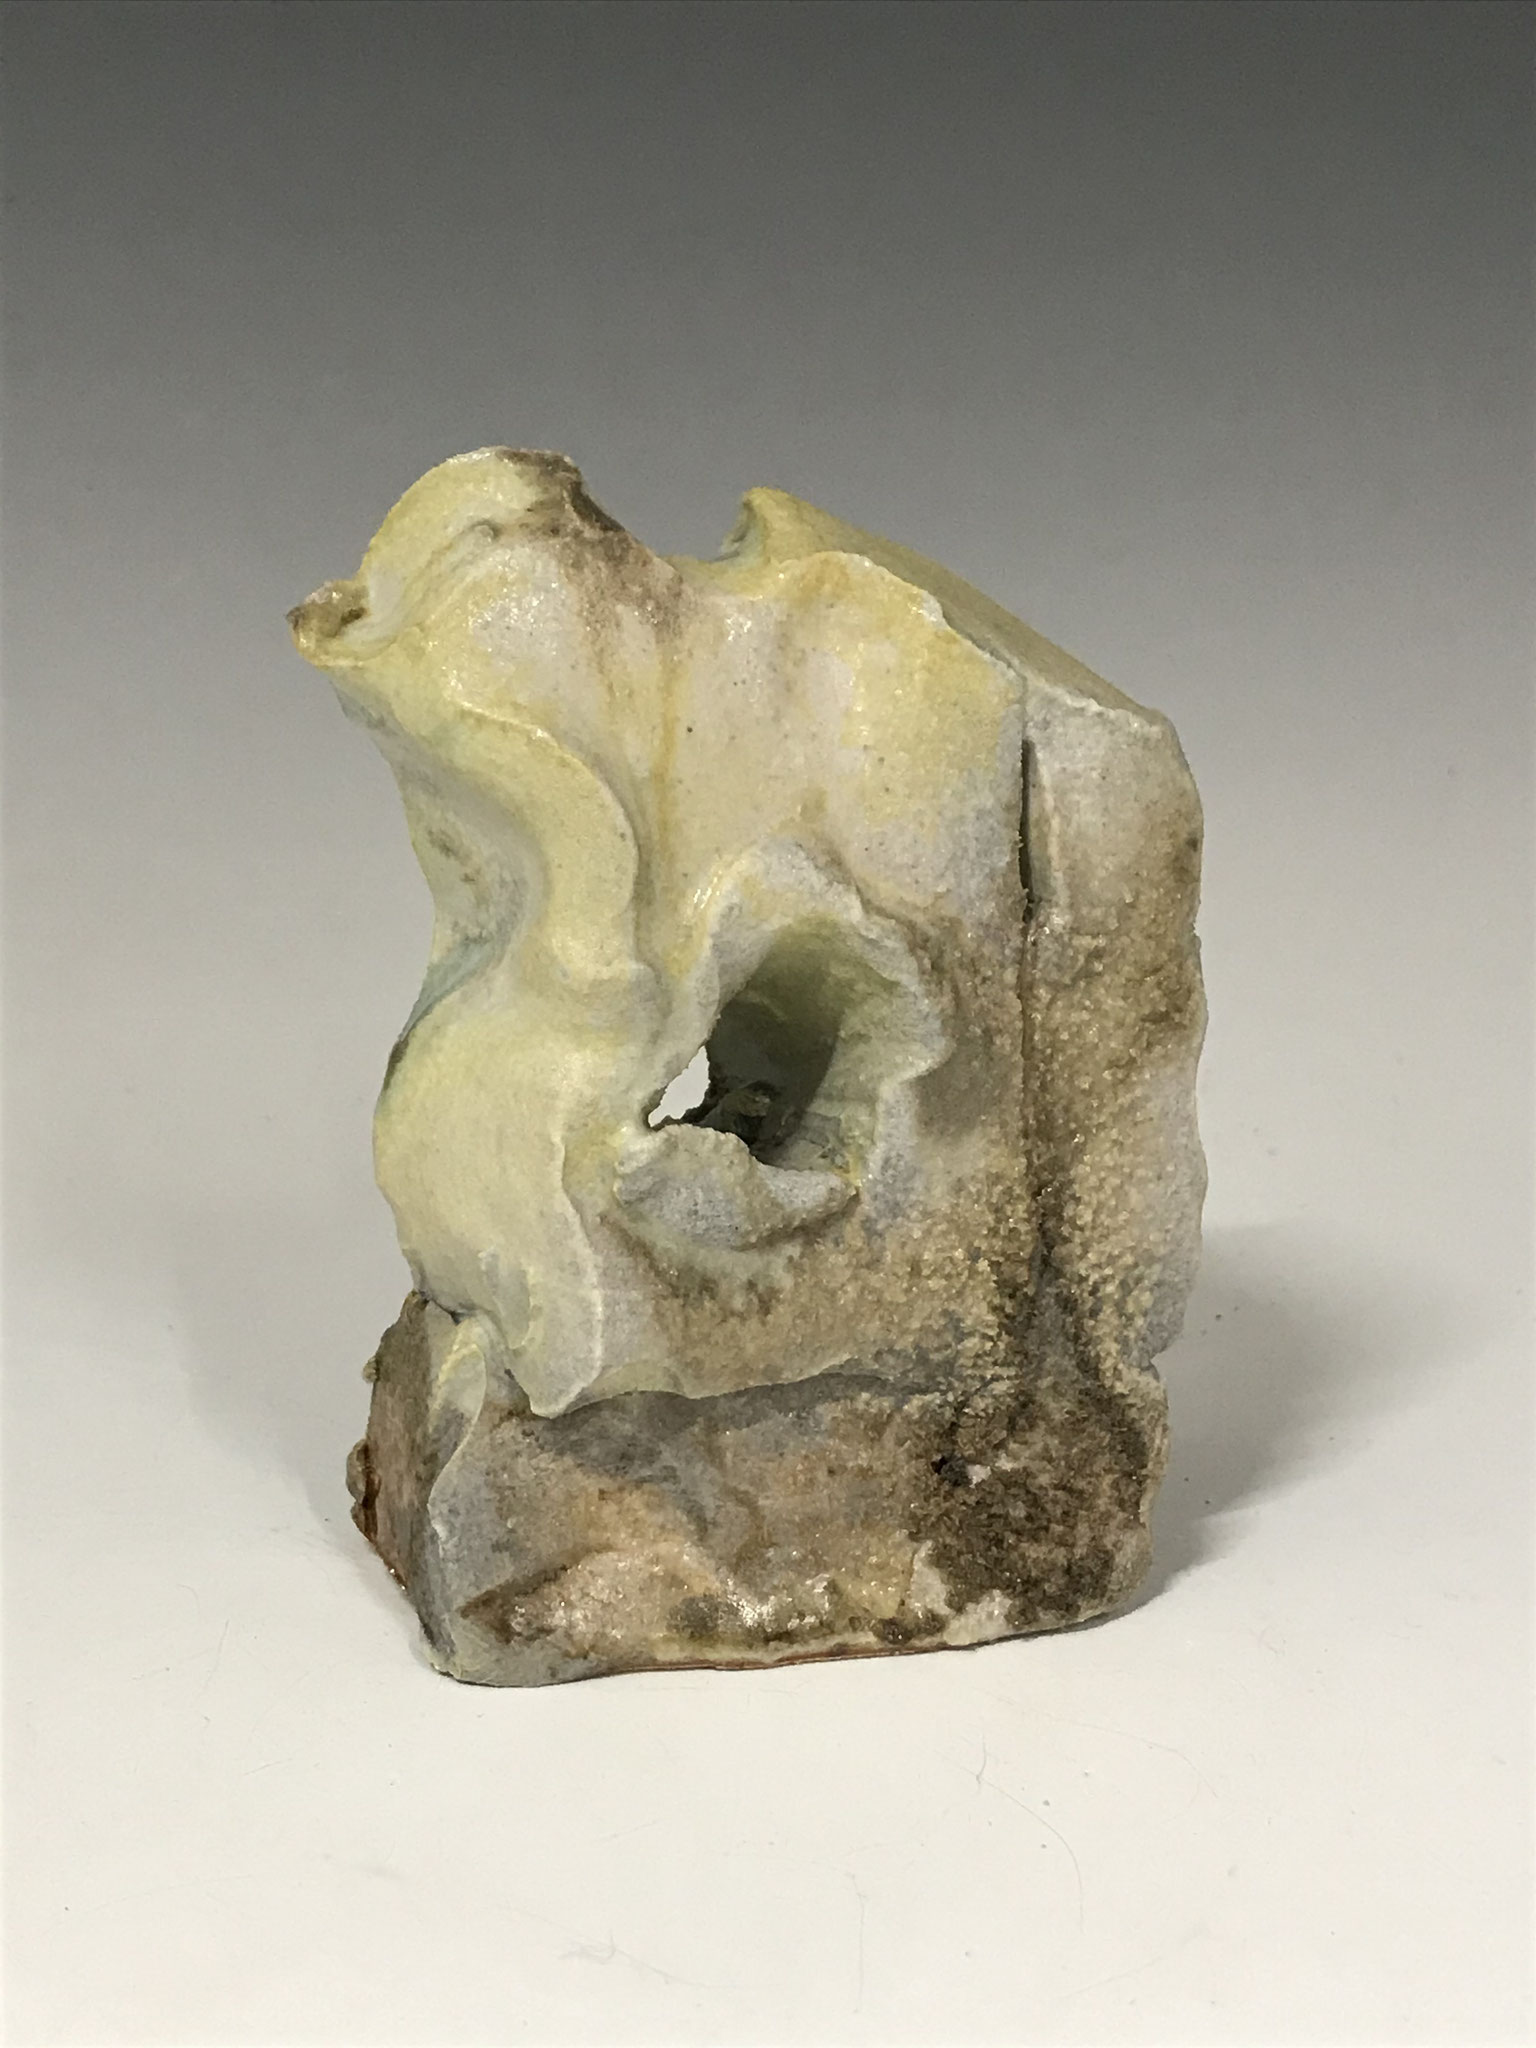 "Lil' wave, 4.25"" x 3"" x 1.5"".  Double wood fired stoneware w/natural ash & ipanema glaze."